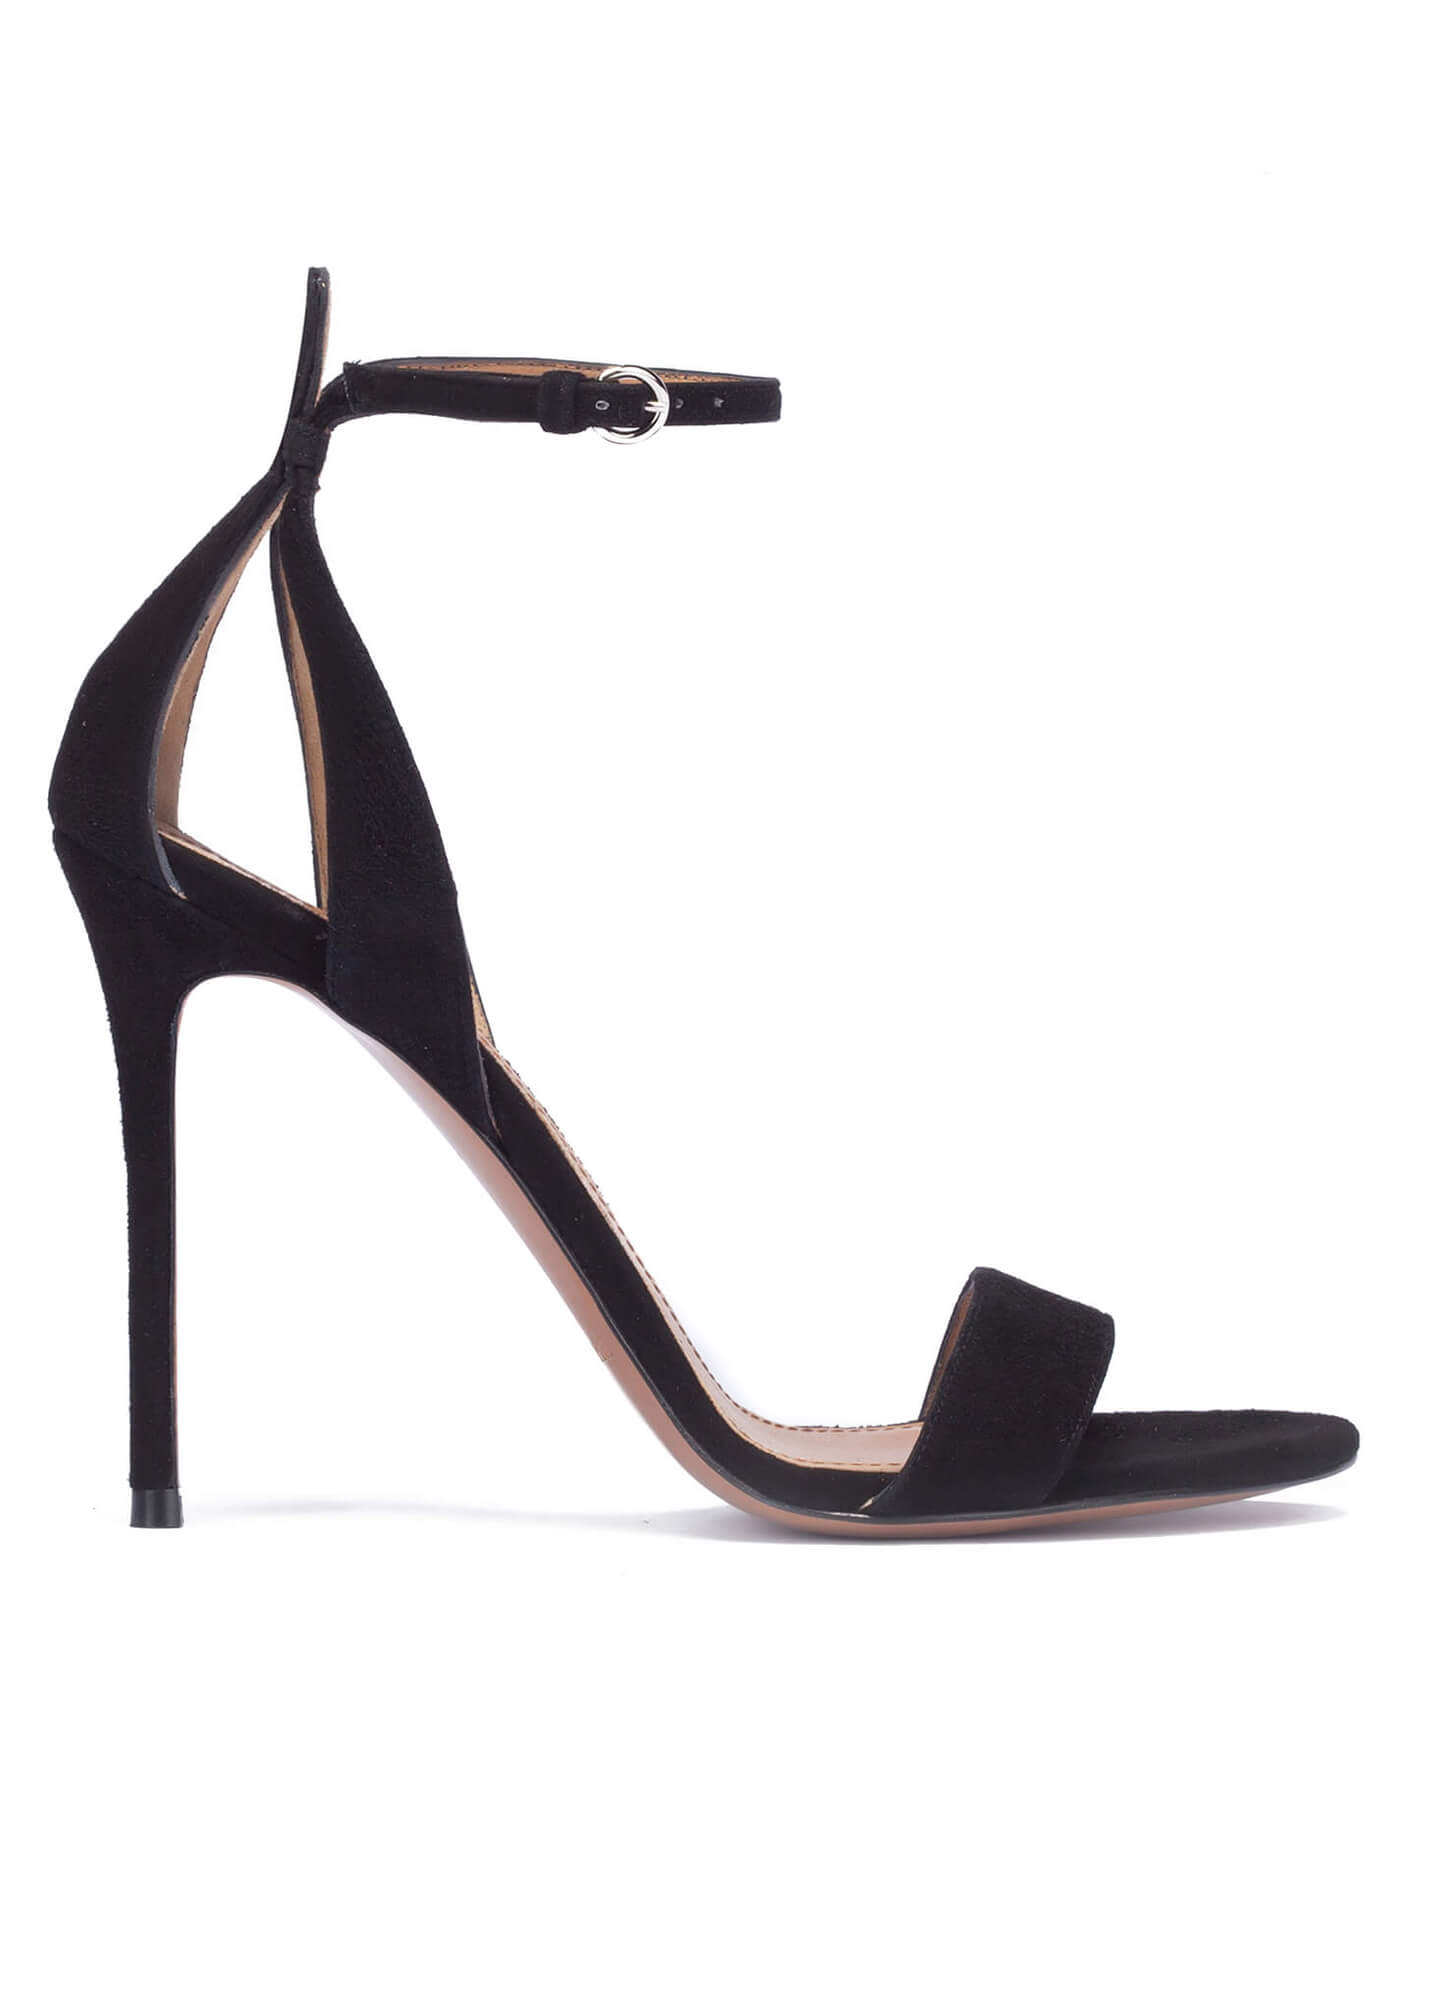 ceec9dba18 Black suede sandals with ankle strap · High heel sandals in black suede -  online shoe store Pura Lopez